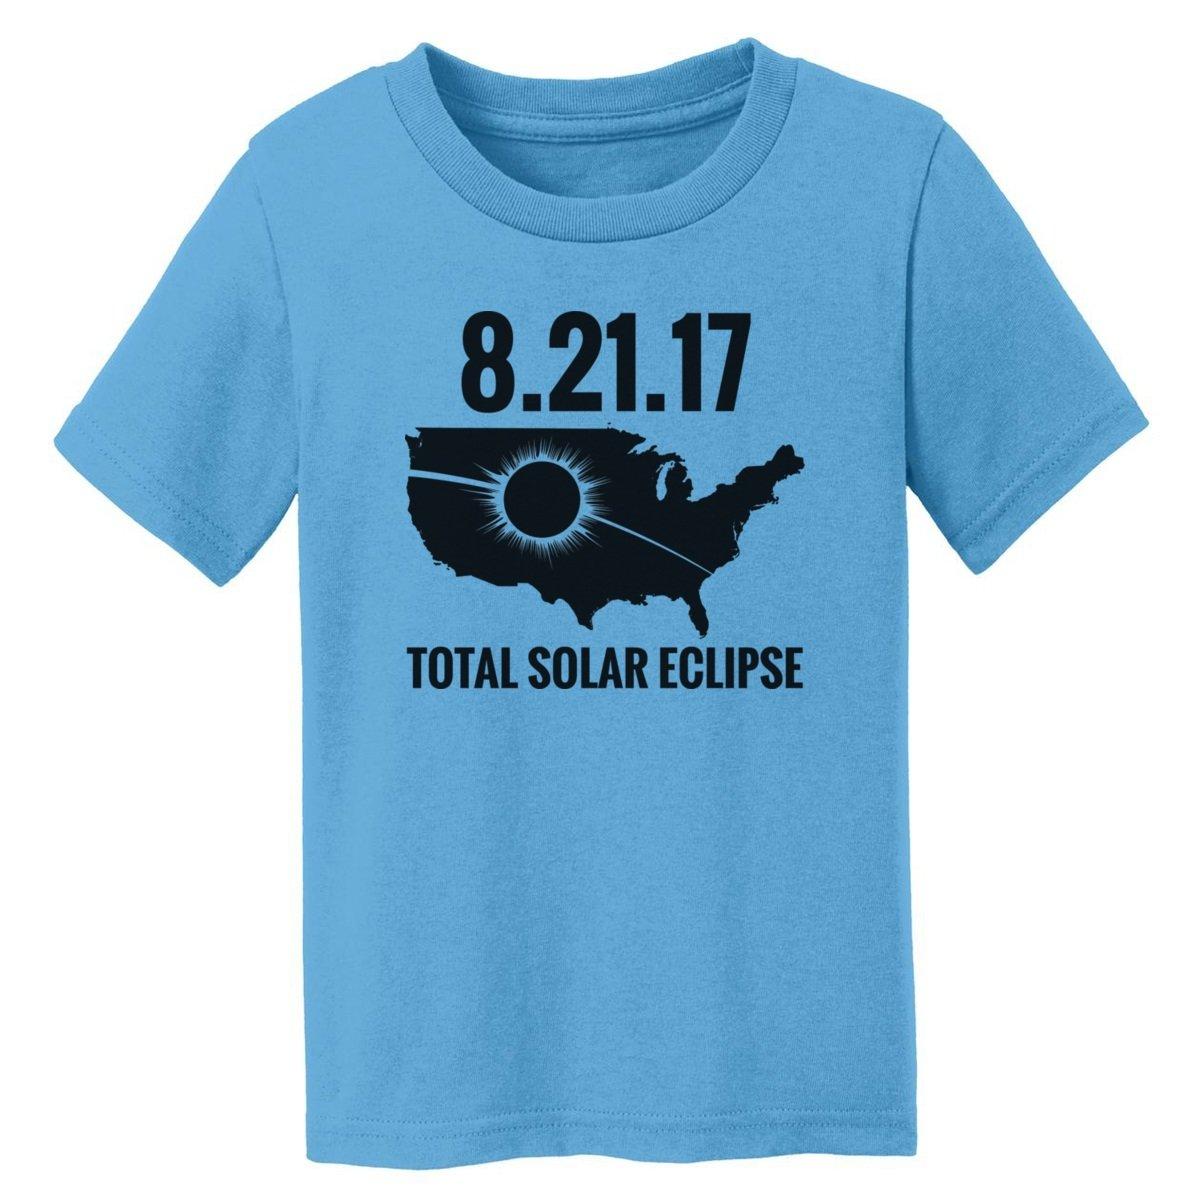 Digital T-Shirt Shop Baby-girls 2017 Total Solar Eclipse USA Total Solar Eclipse